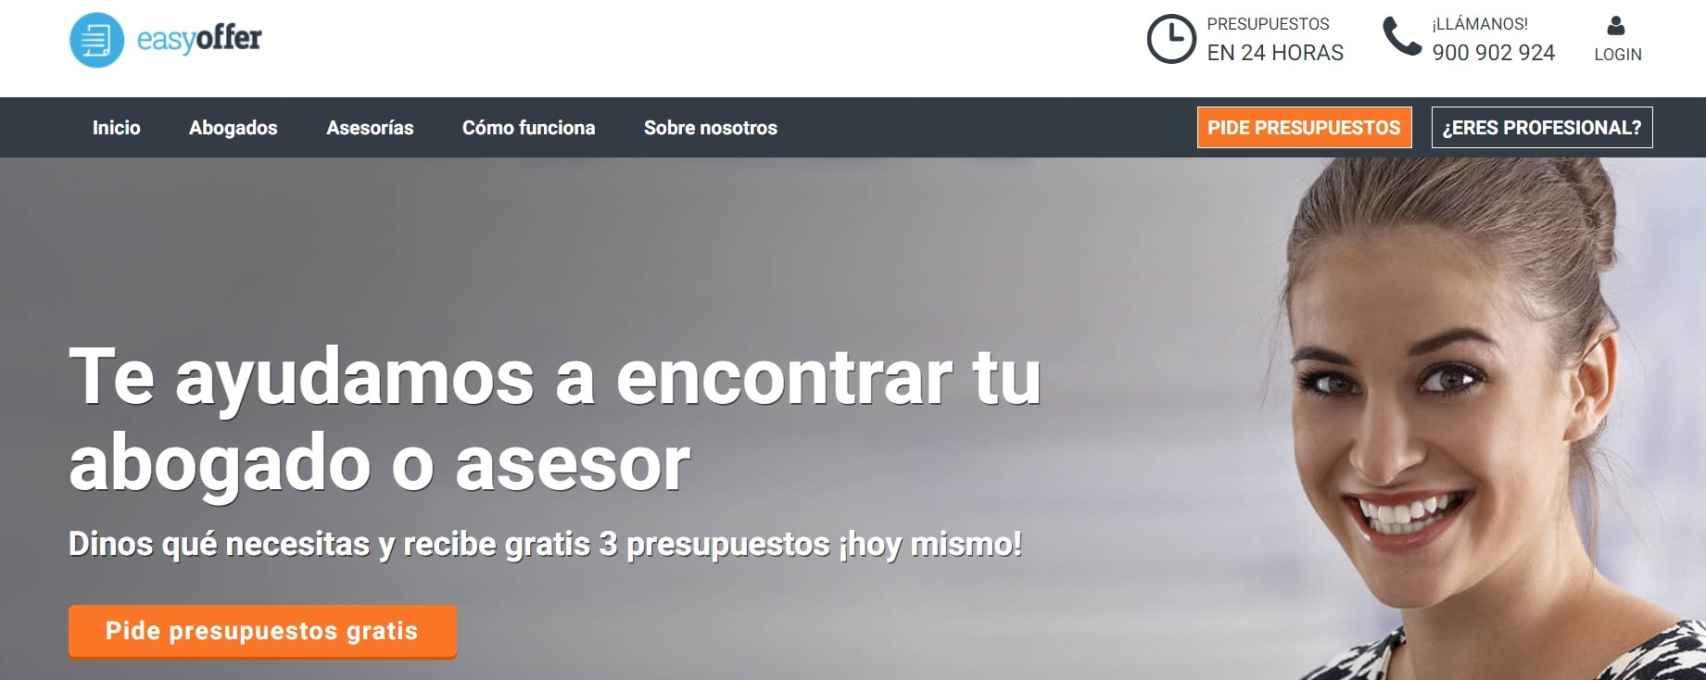 Página web de Eassyofer.